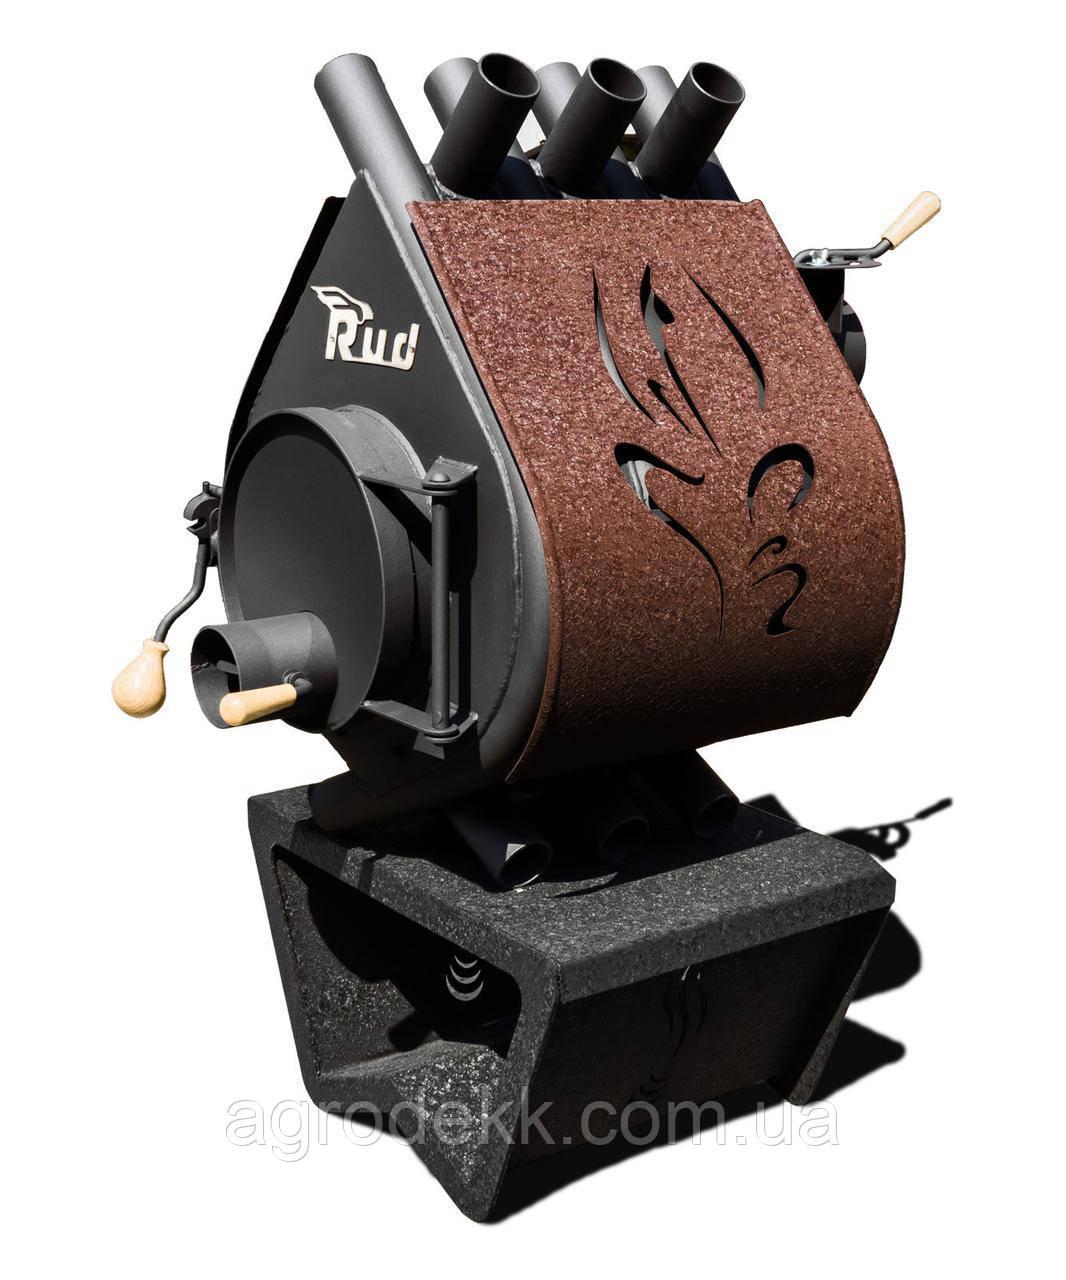 Печь Rud Pyrotron Кантри 00 (отапливаемая площадь 40 кв.м. х 2,5 м)